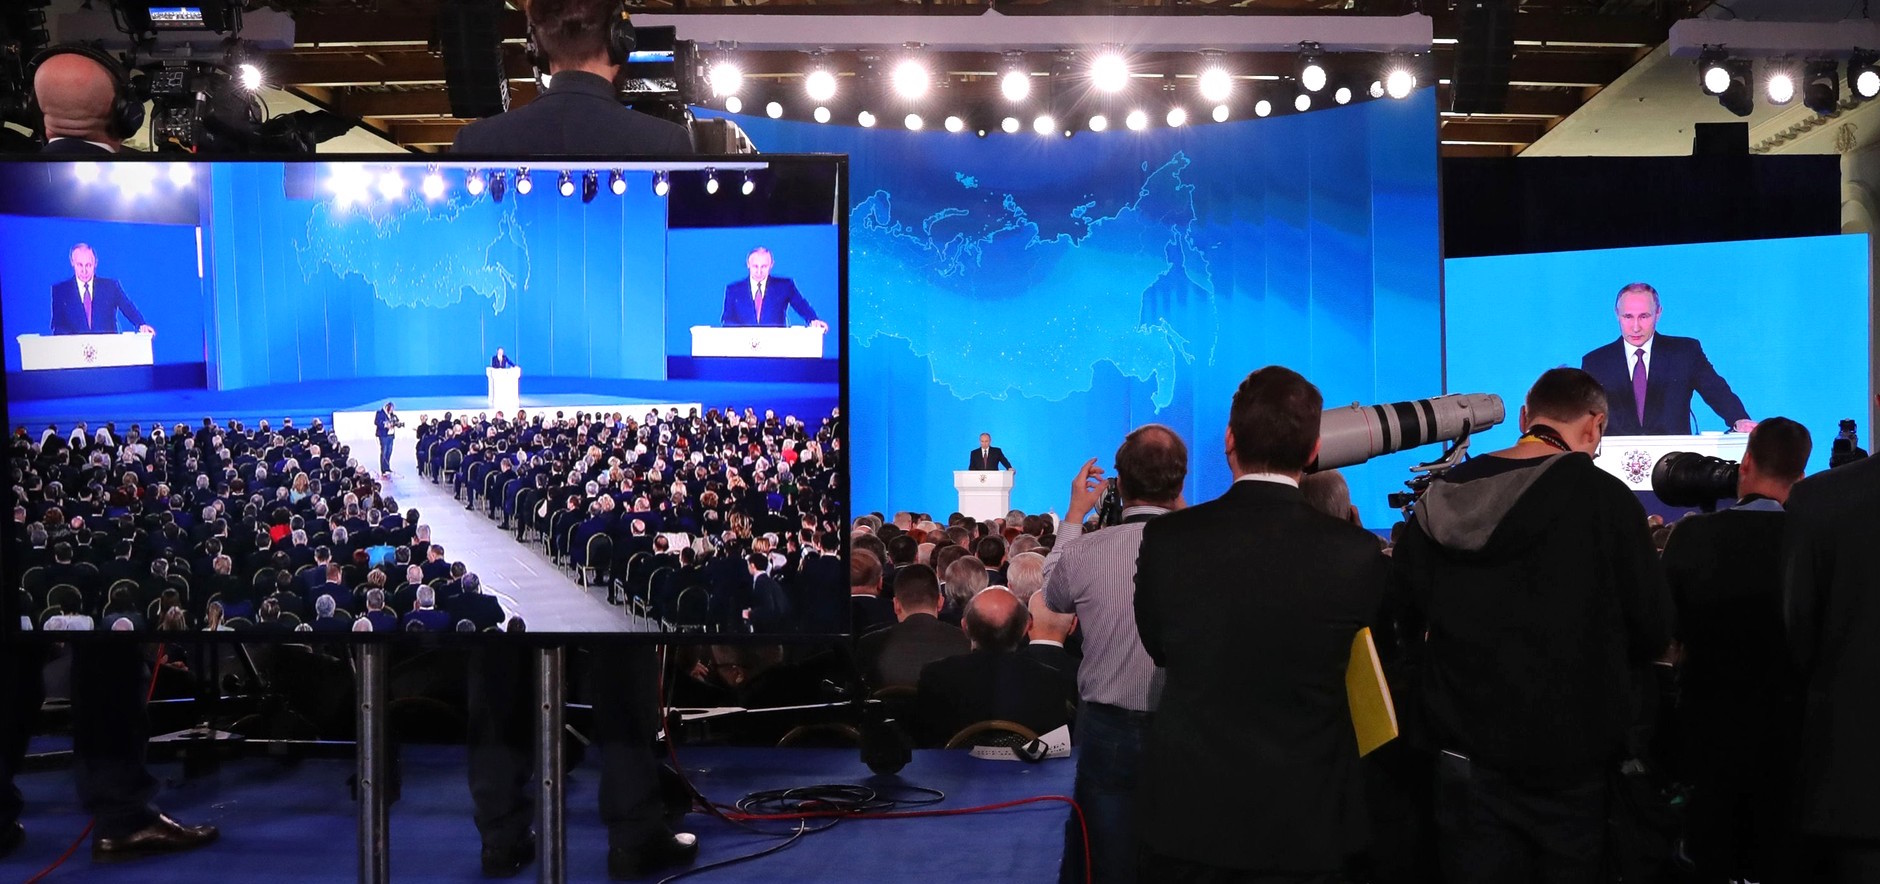 Vladimir Putin addresses Russia's Federal Assembly on 1 March (Photo: Kremlin.ru)